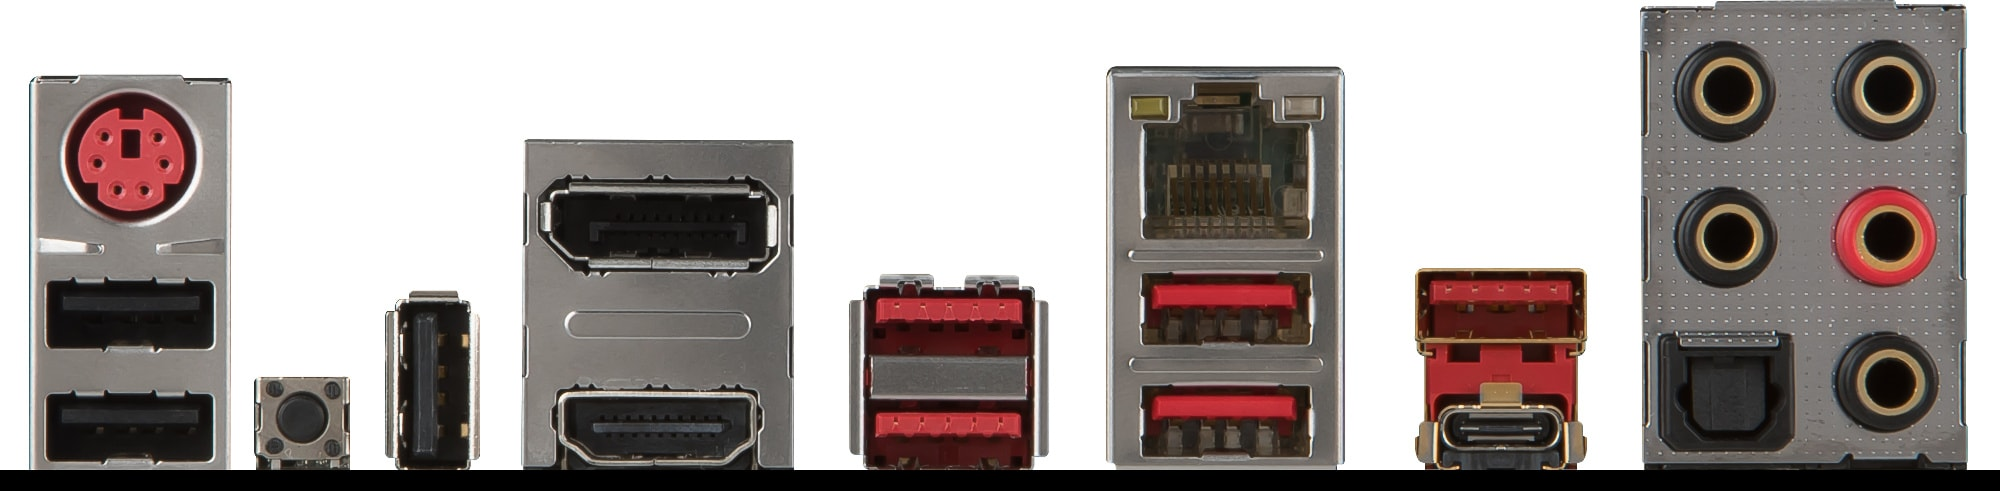 MSI X370 XPOWER GAMING TITANIUM ATX DDR4 - Carte mère MSI - 3